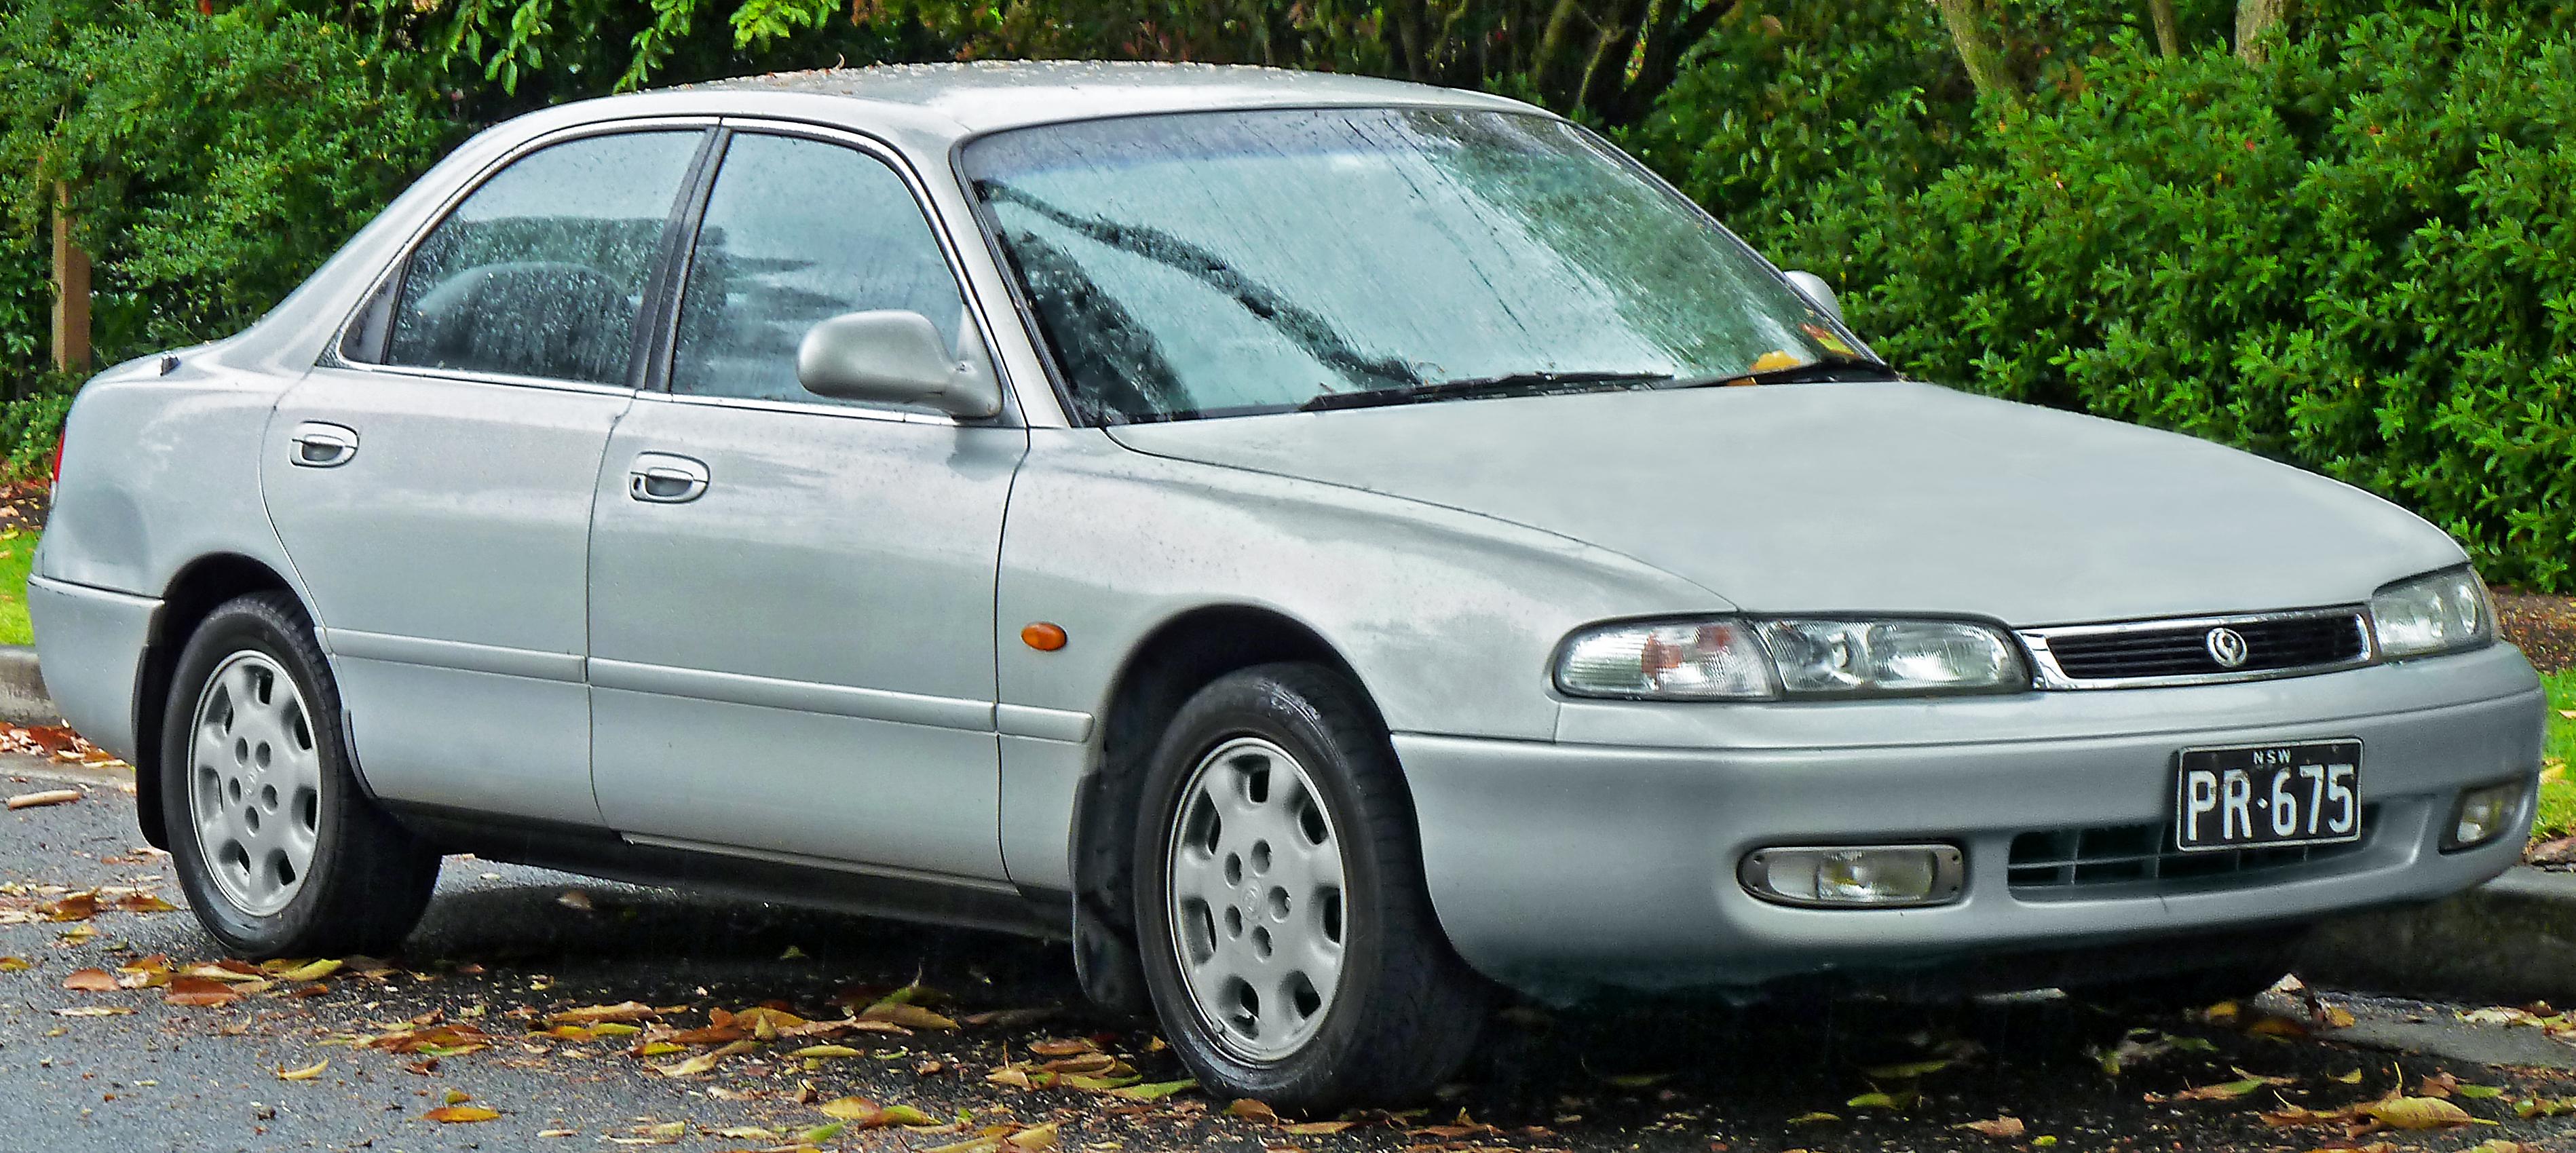 Mazda 626 Mitula Voiture